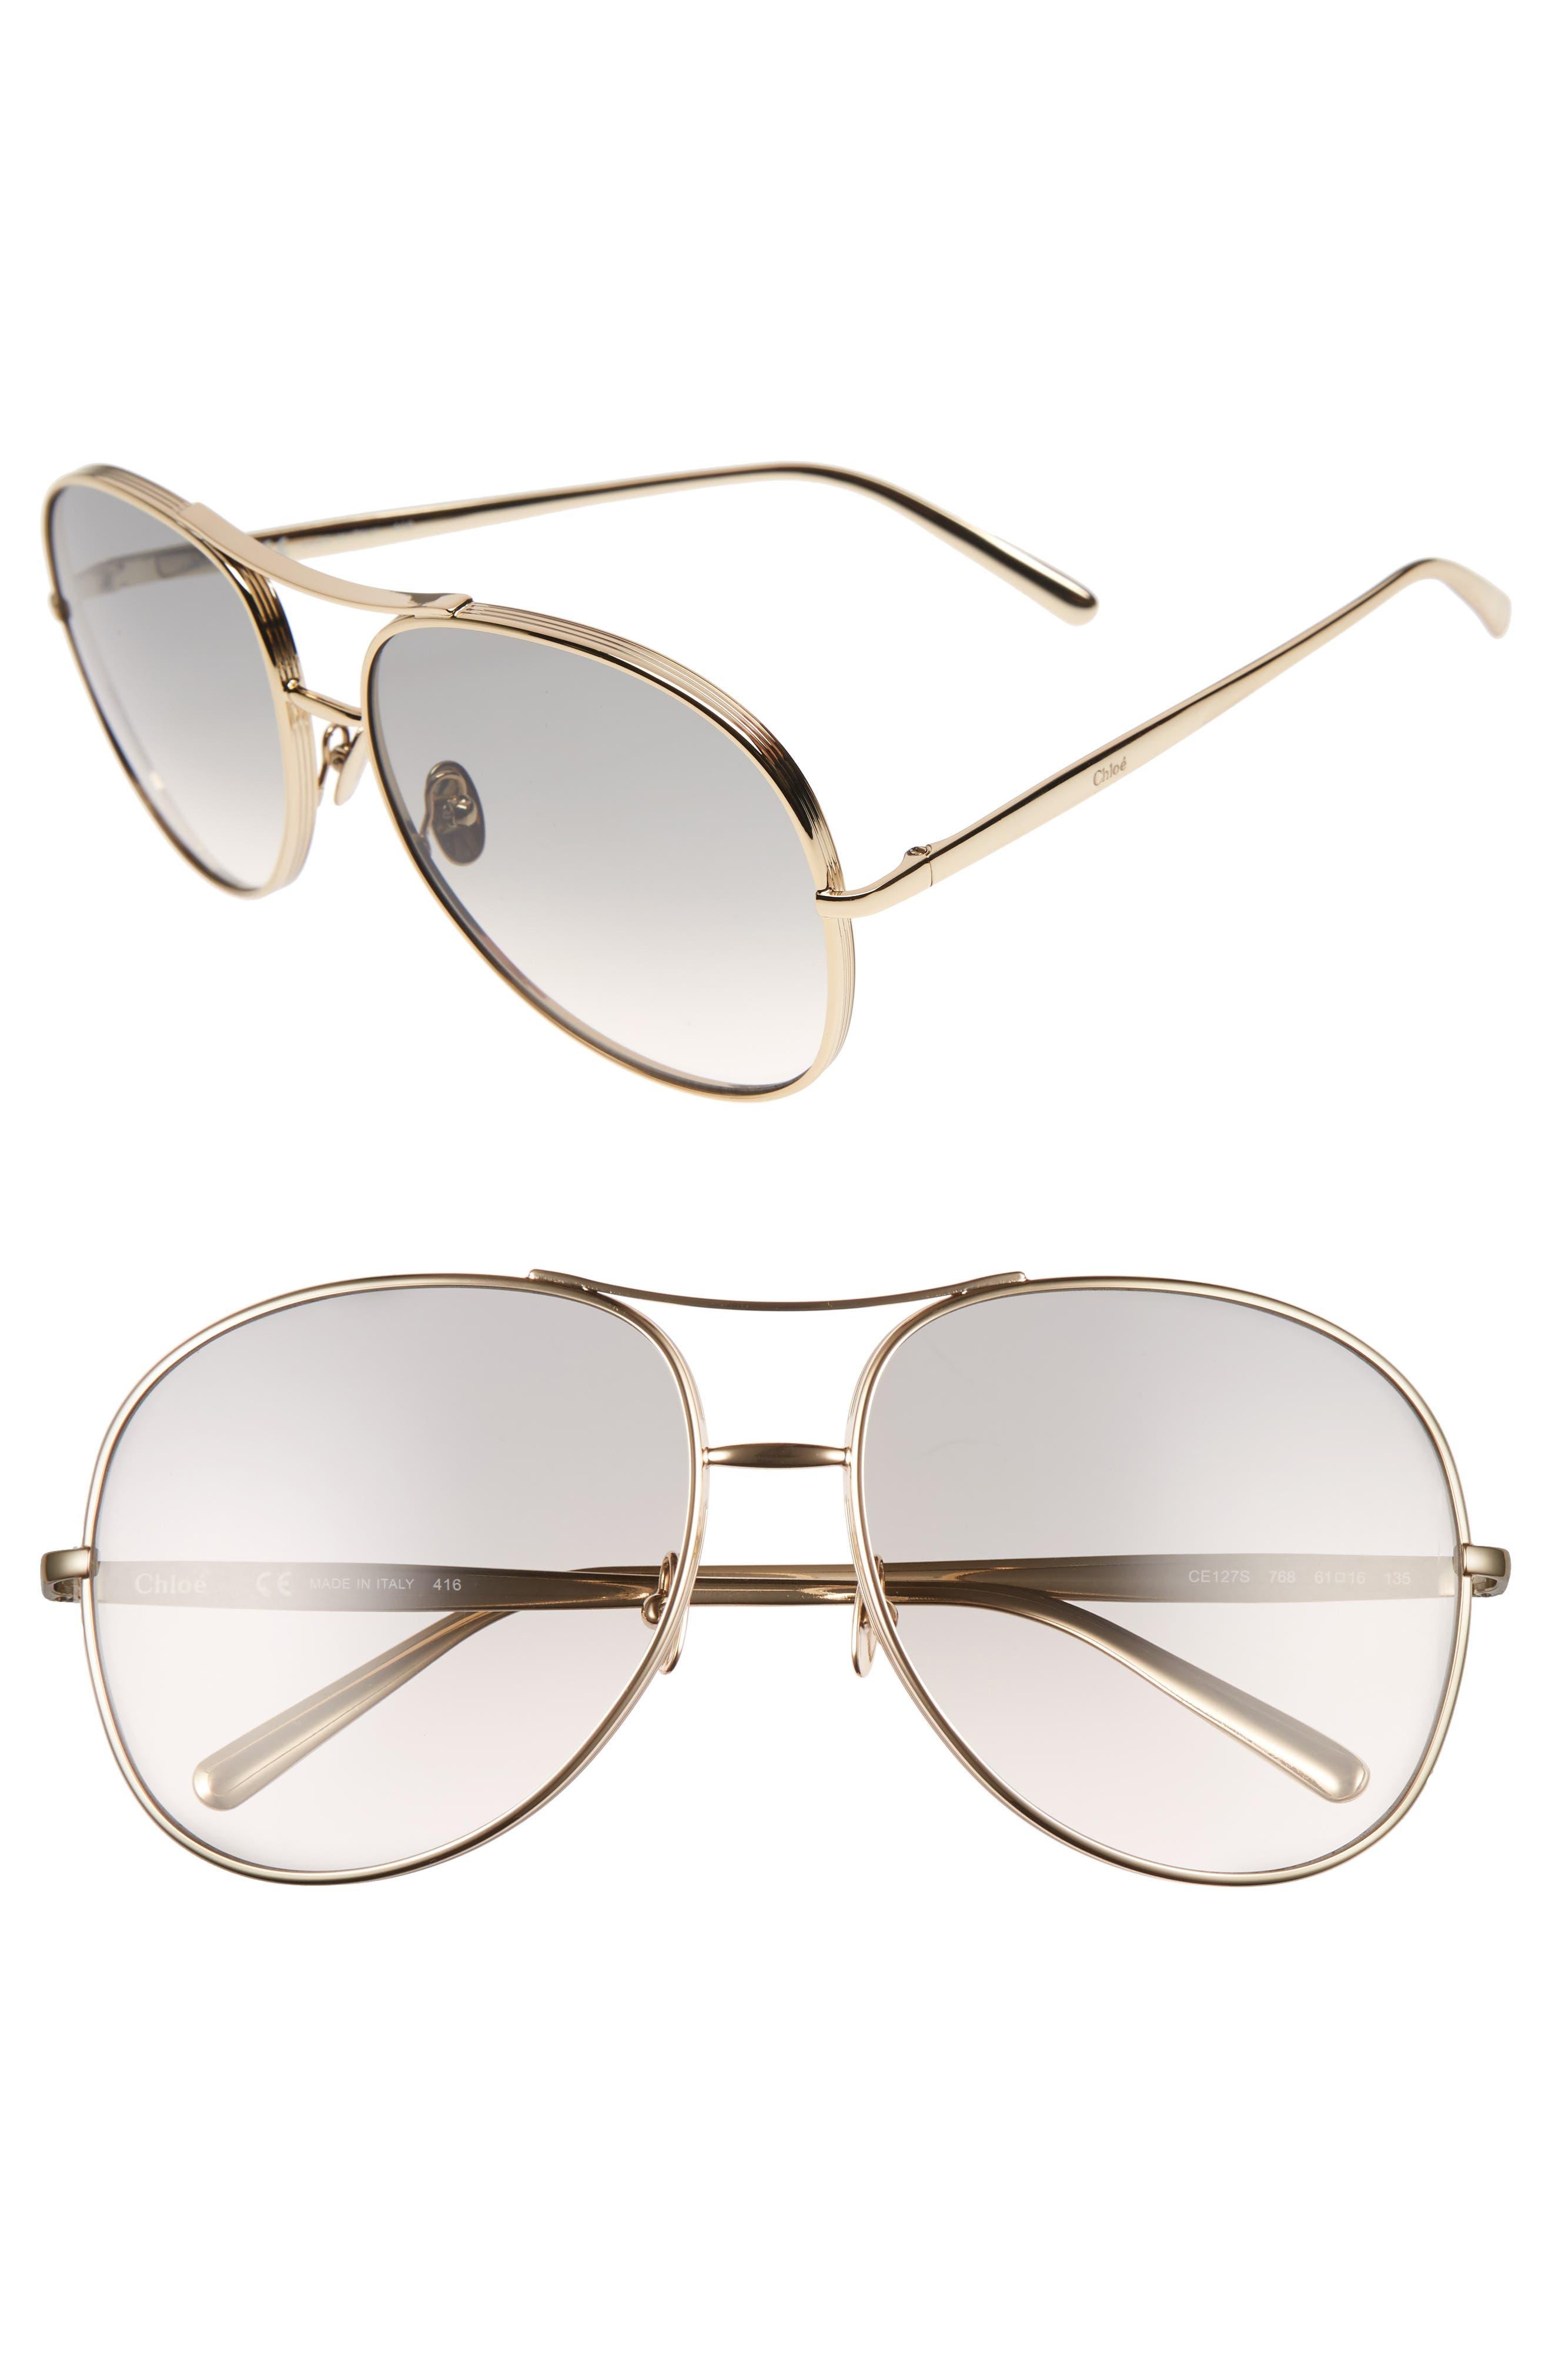 61mm Oversize Sunglasses,                             Alternate thumbnail 6, color,